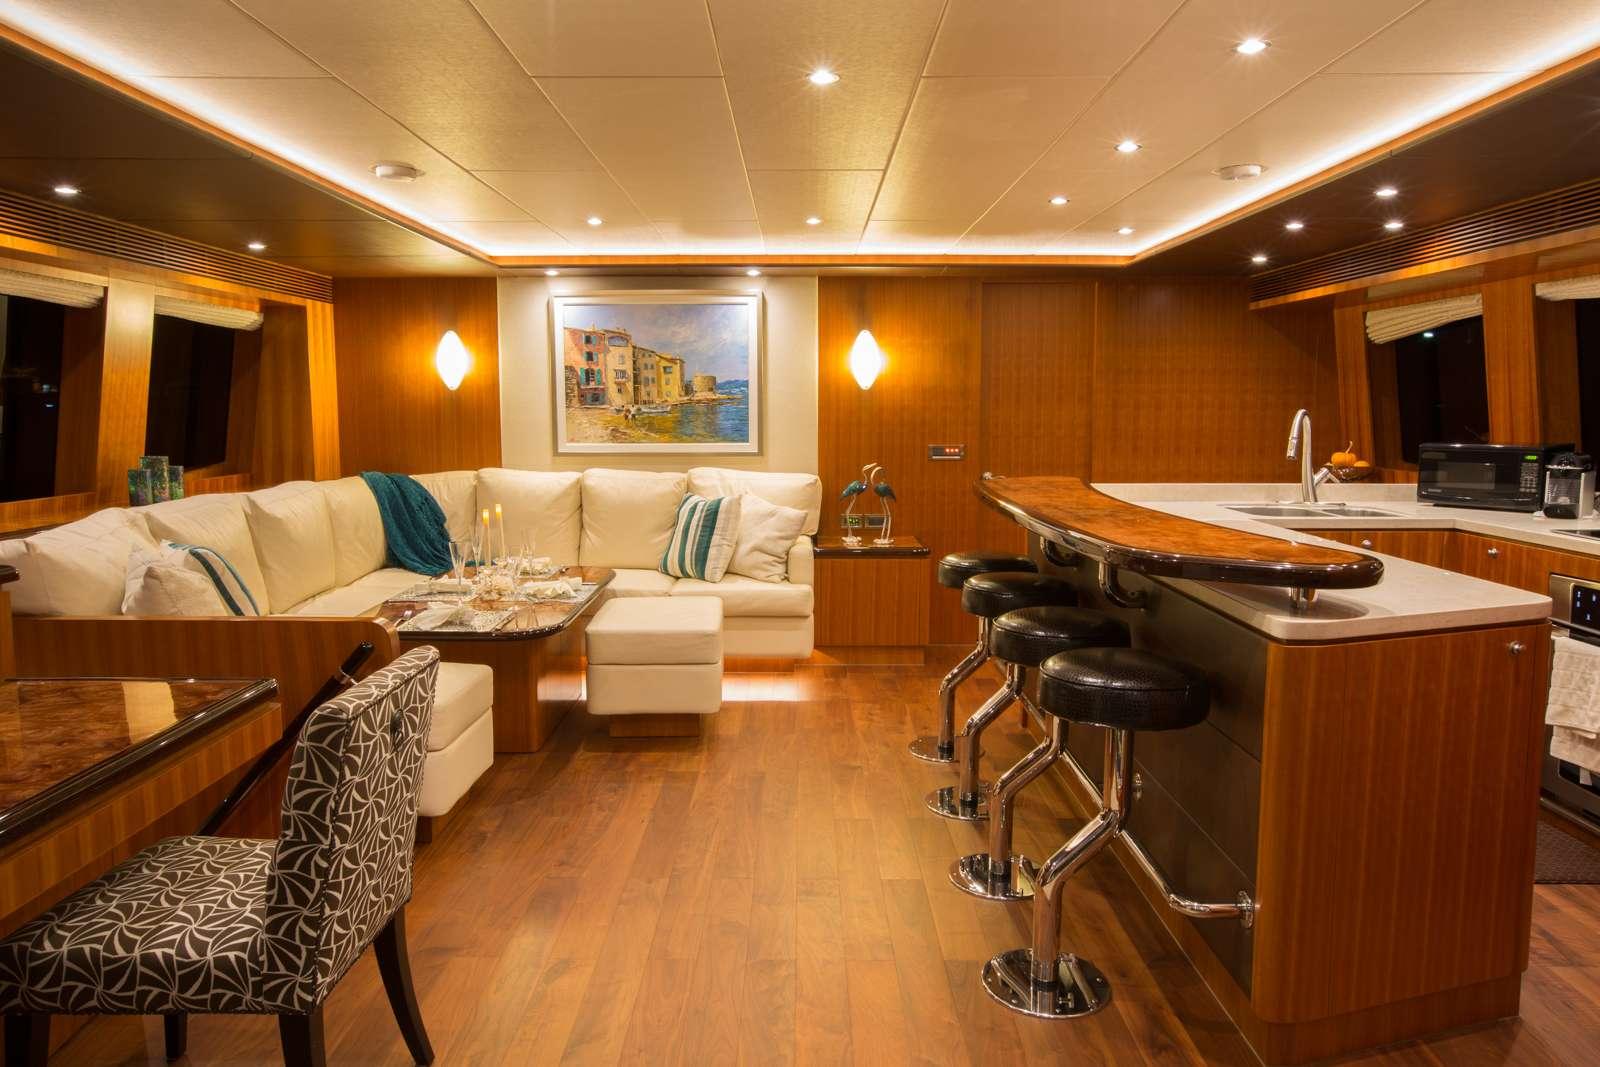 Catamaran Yacht 'SEA BOSS', 6 PAX, 2 Crew, 60.00 Ft, 18.00 Meters, Built 2016, Horizon